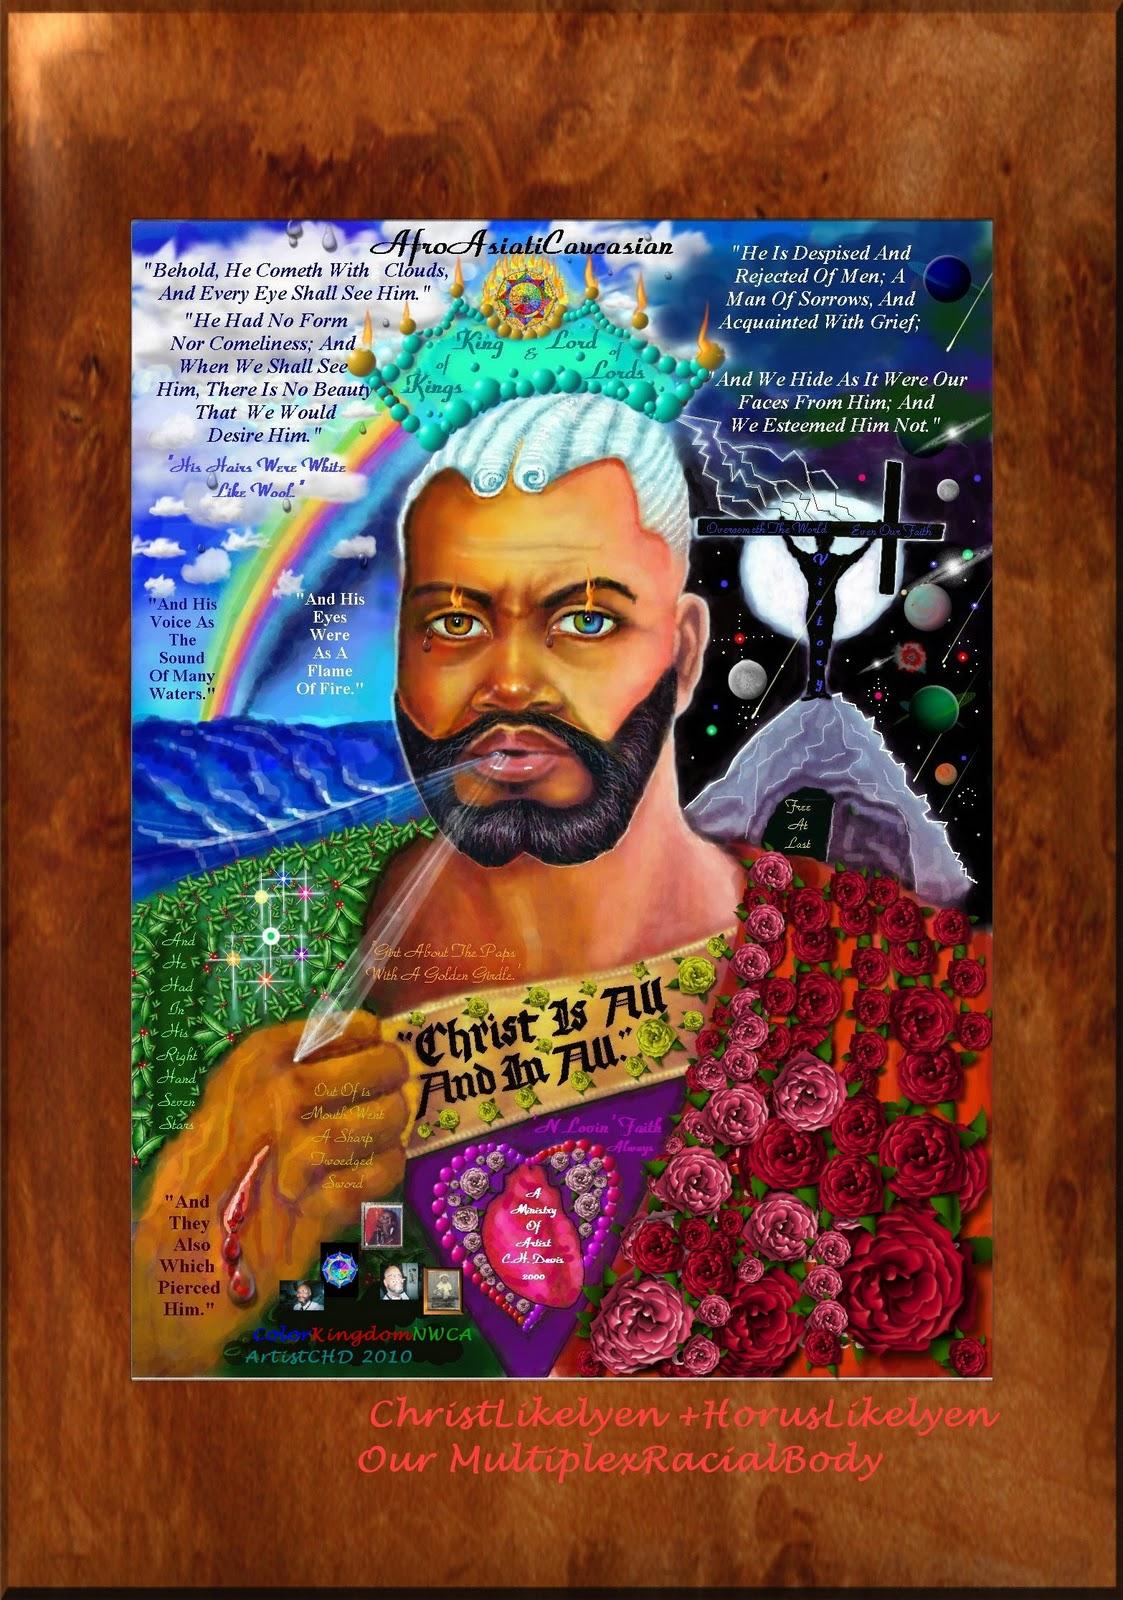 christlikelyen vs christian ameriafrindian artistchd christ horusheart divinity deity quarinity4 indwelling spirituality spiritious vs religious